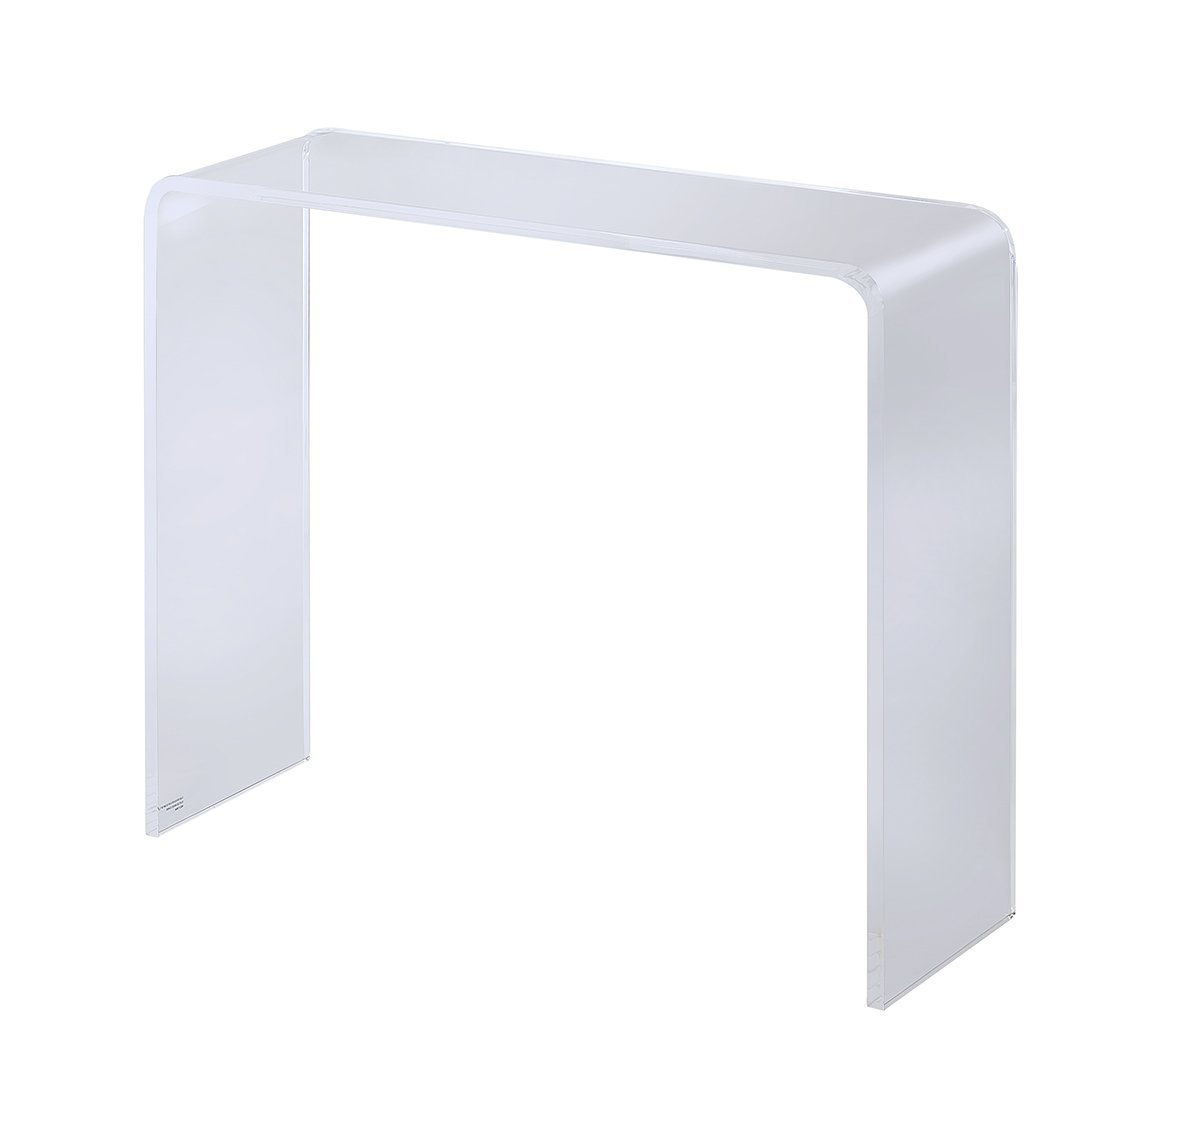 Terrific Amazon Com Foxhill Trading Pure Decor Acrylic Console 9 Spiritservingveterans Wood Chair Design Ideas Spiritservingveteransorg